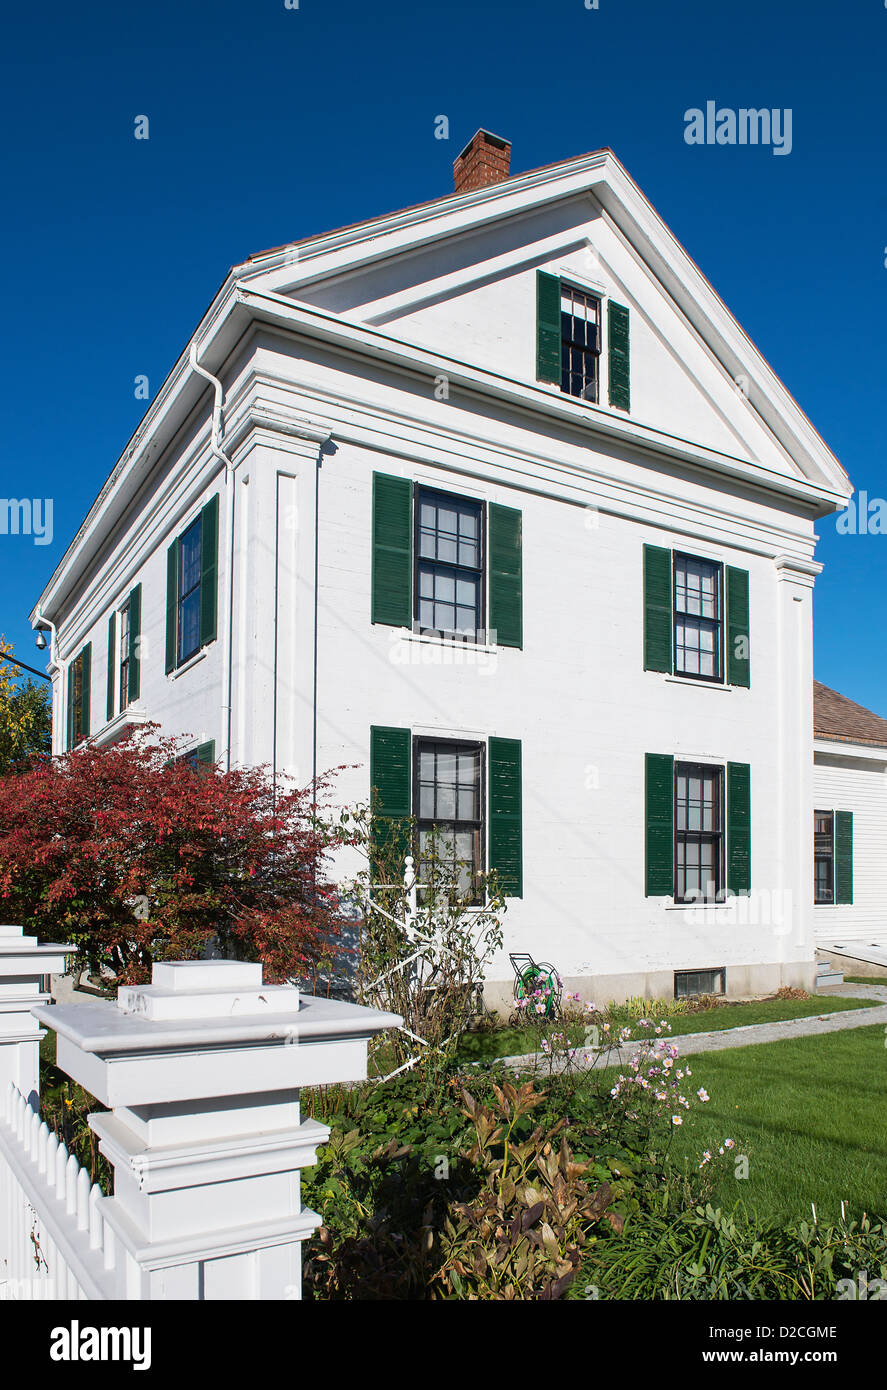 Farnsworth Homestead, Rockland, Maine, USA - Stock Image